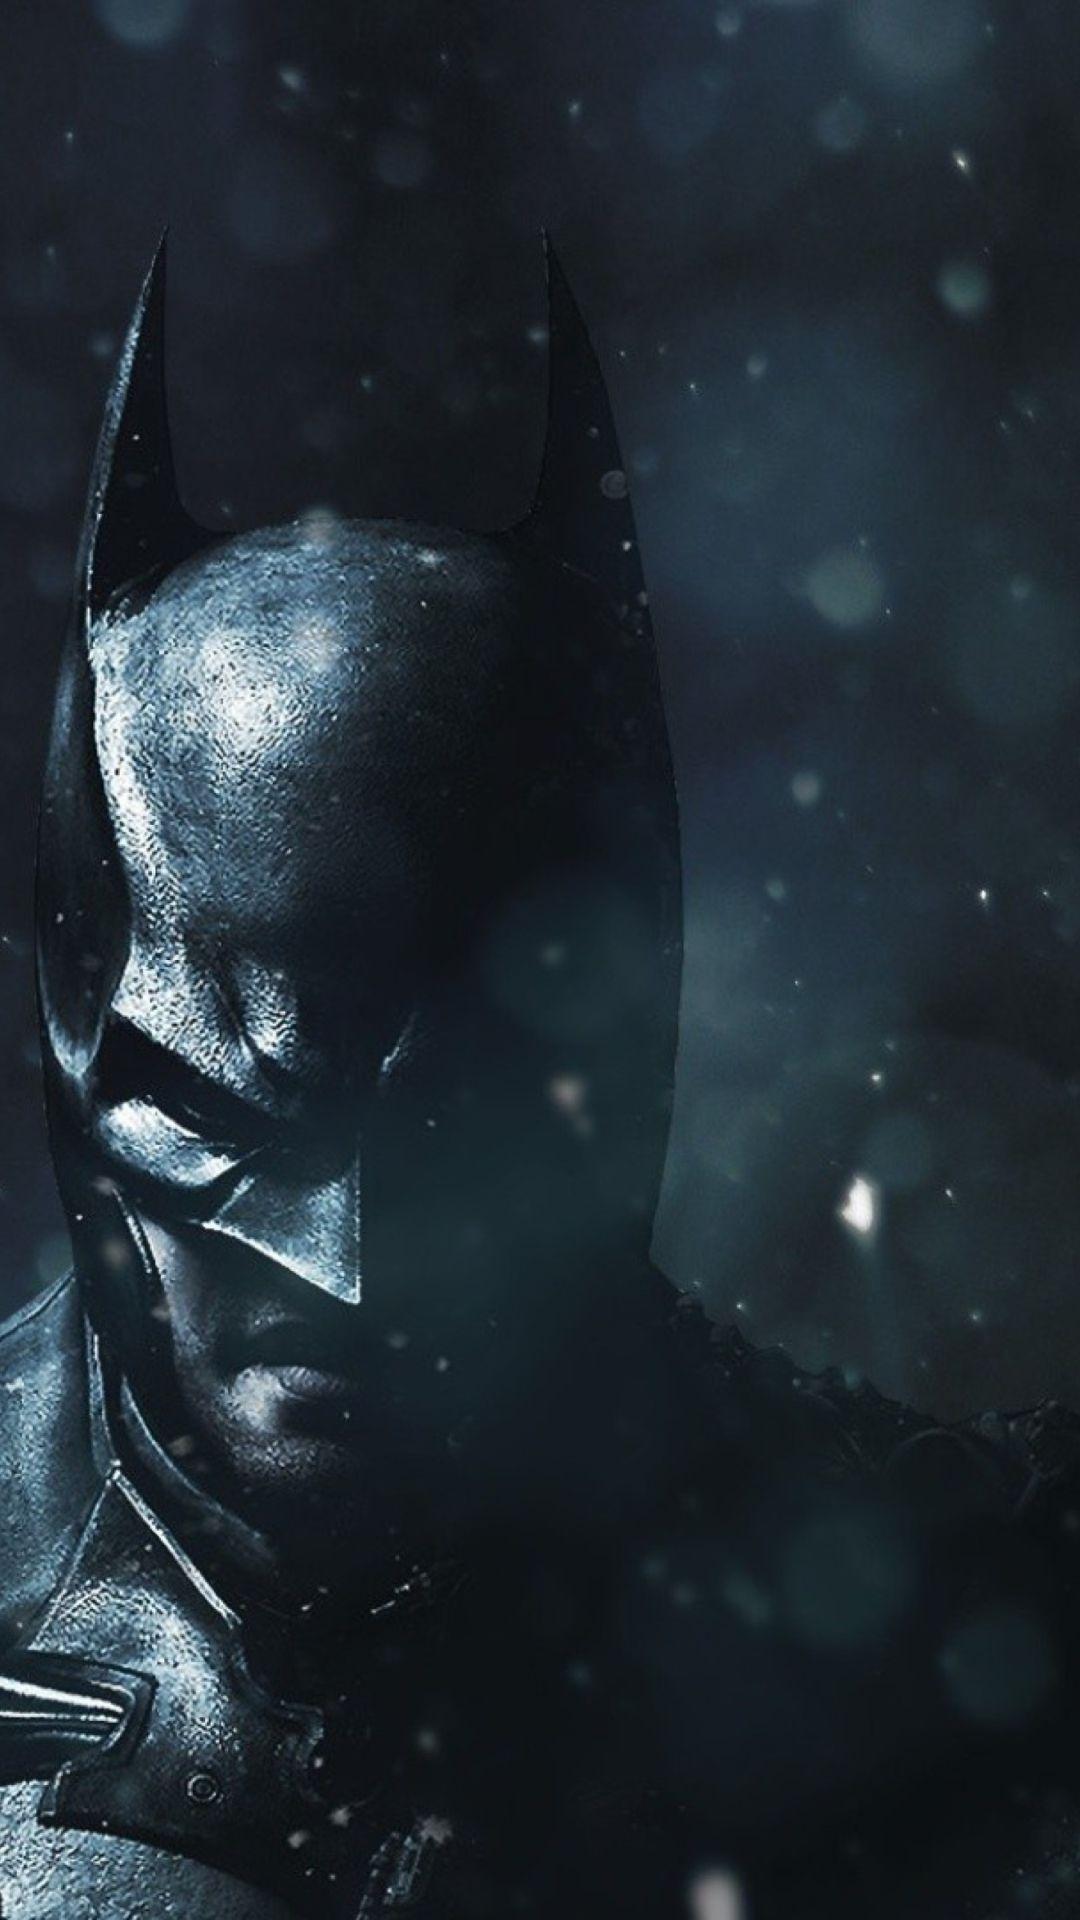 Great 9 Joker And Batman Wallpapers Iphone Background For Your Android Or Iphone Wallpapers Android Iphone Wal Batman Batman Wallpaper Batman Arkham Origins